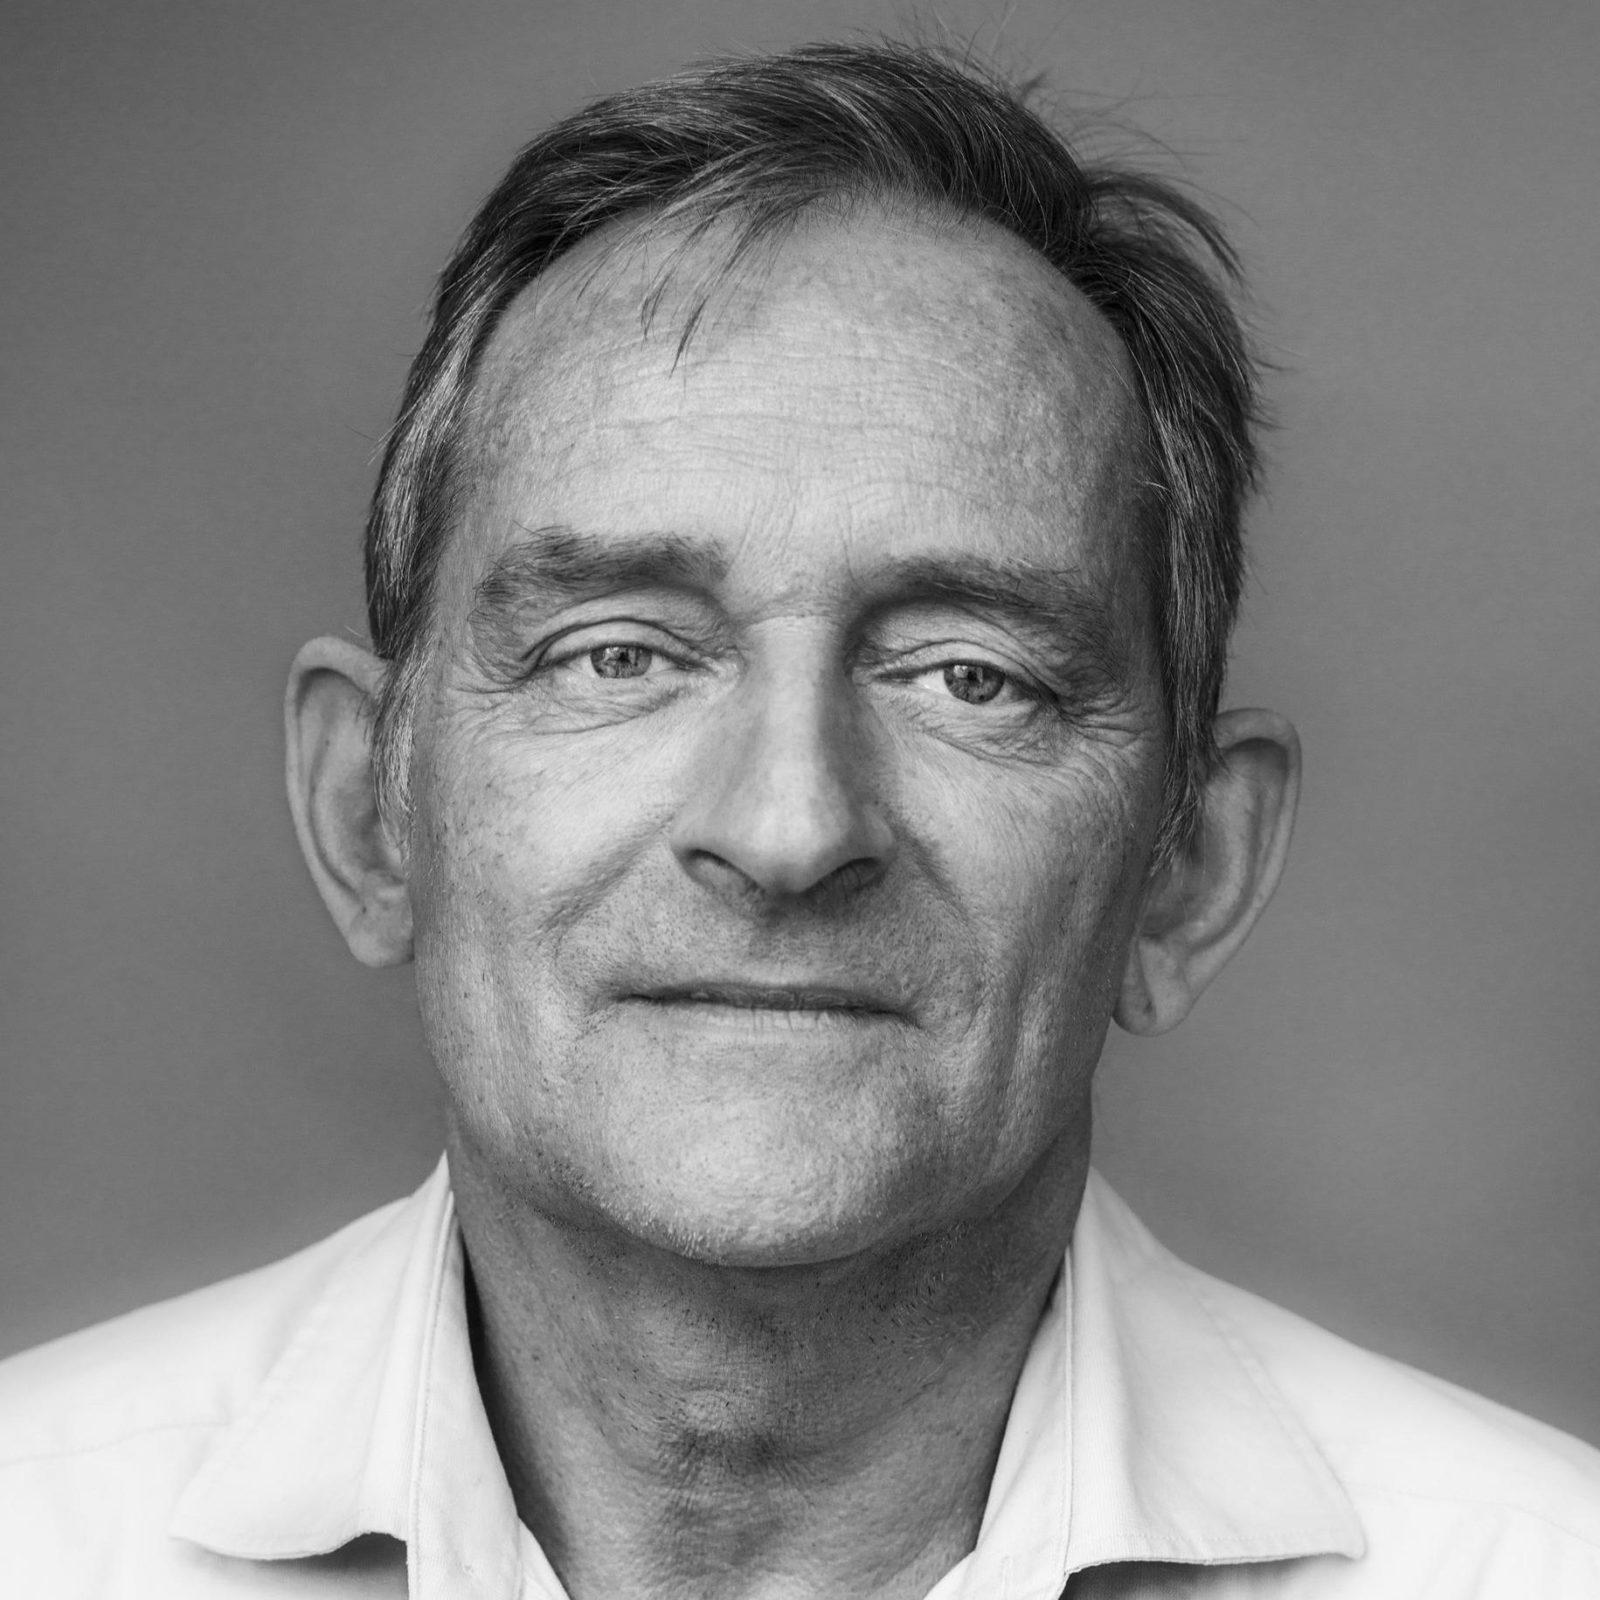 Erwin Mortier